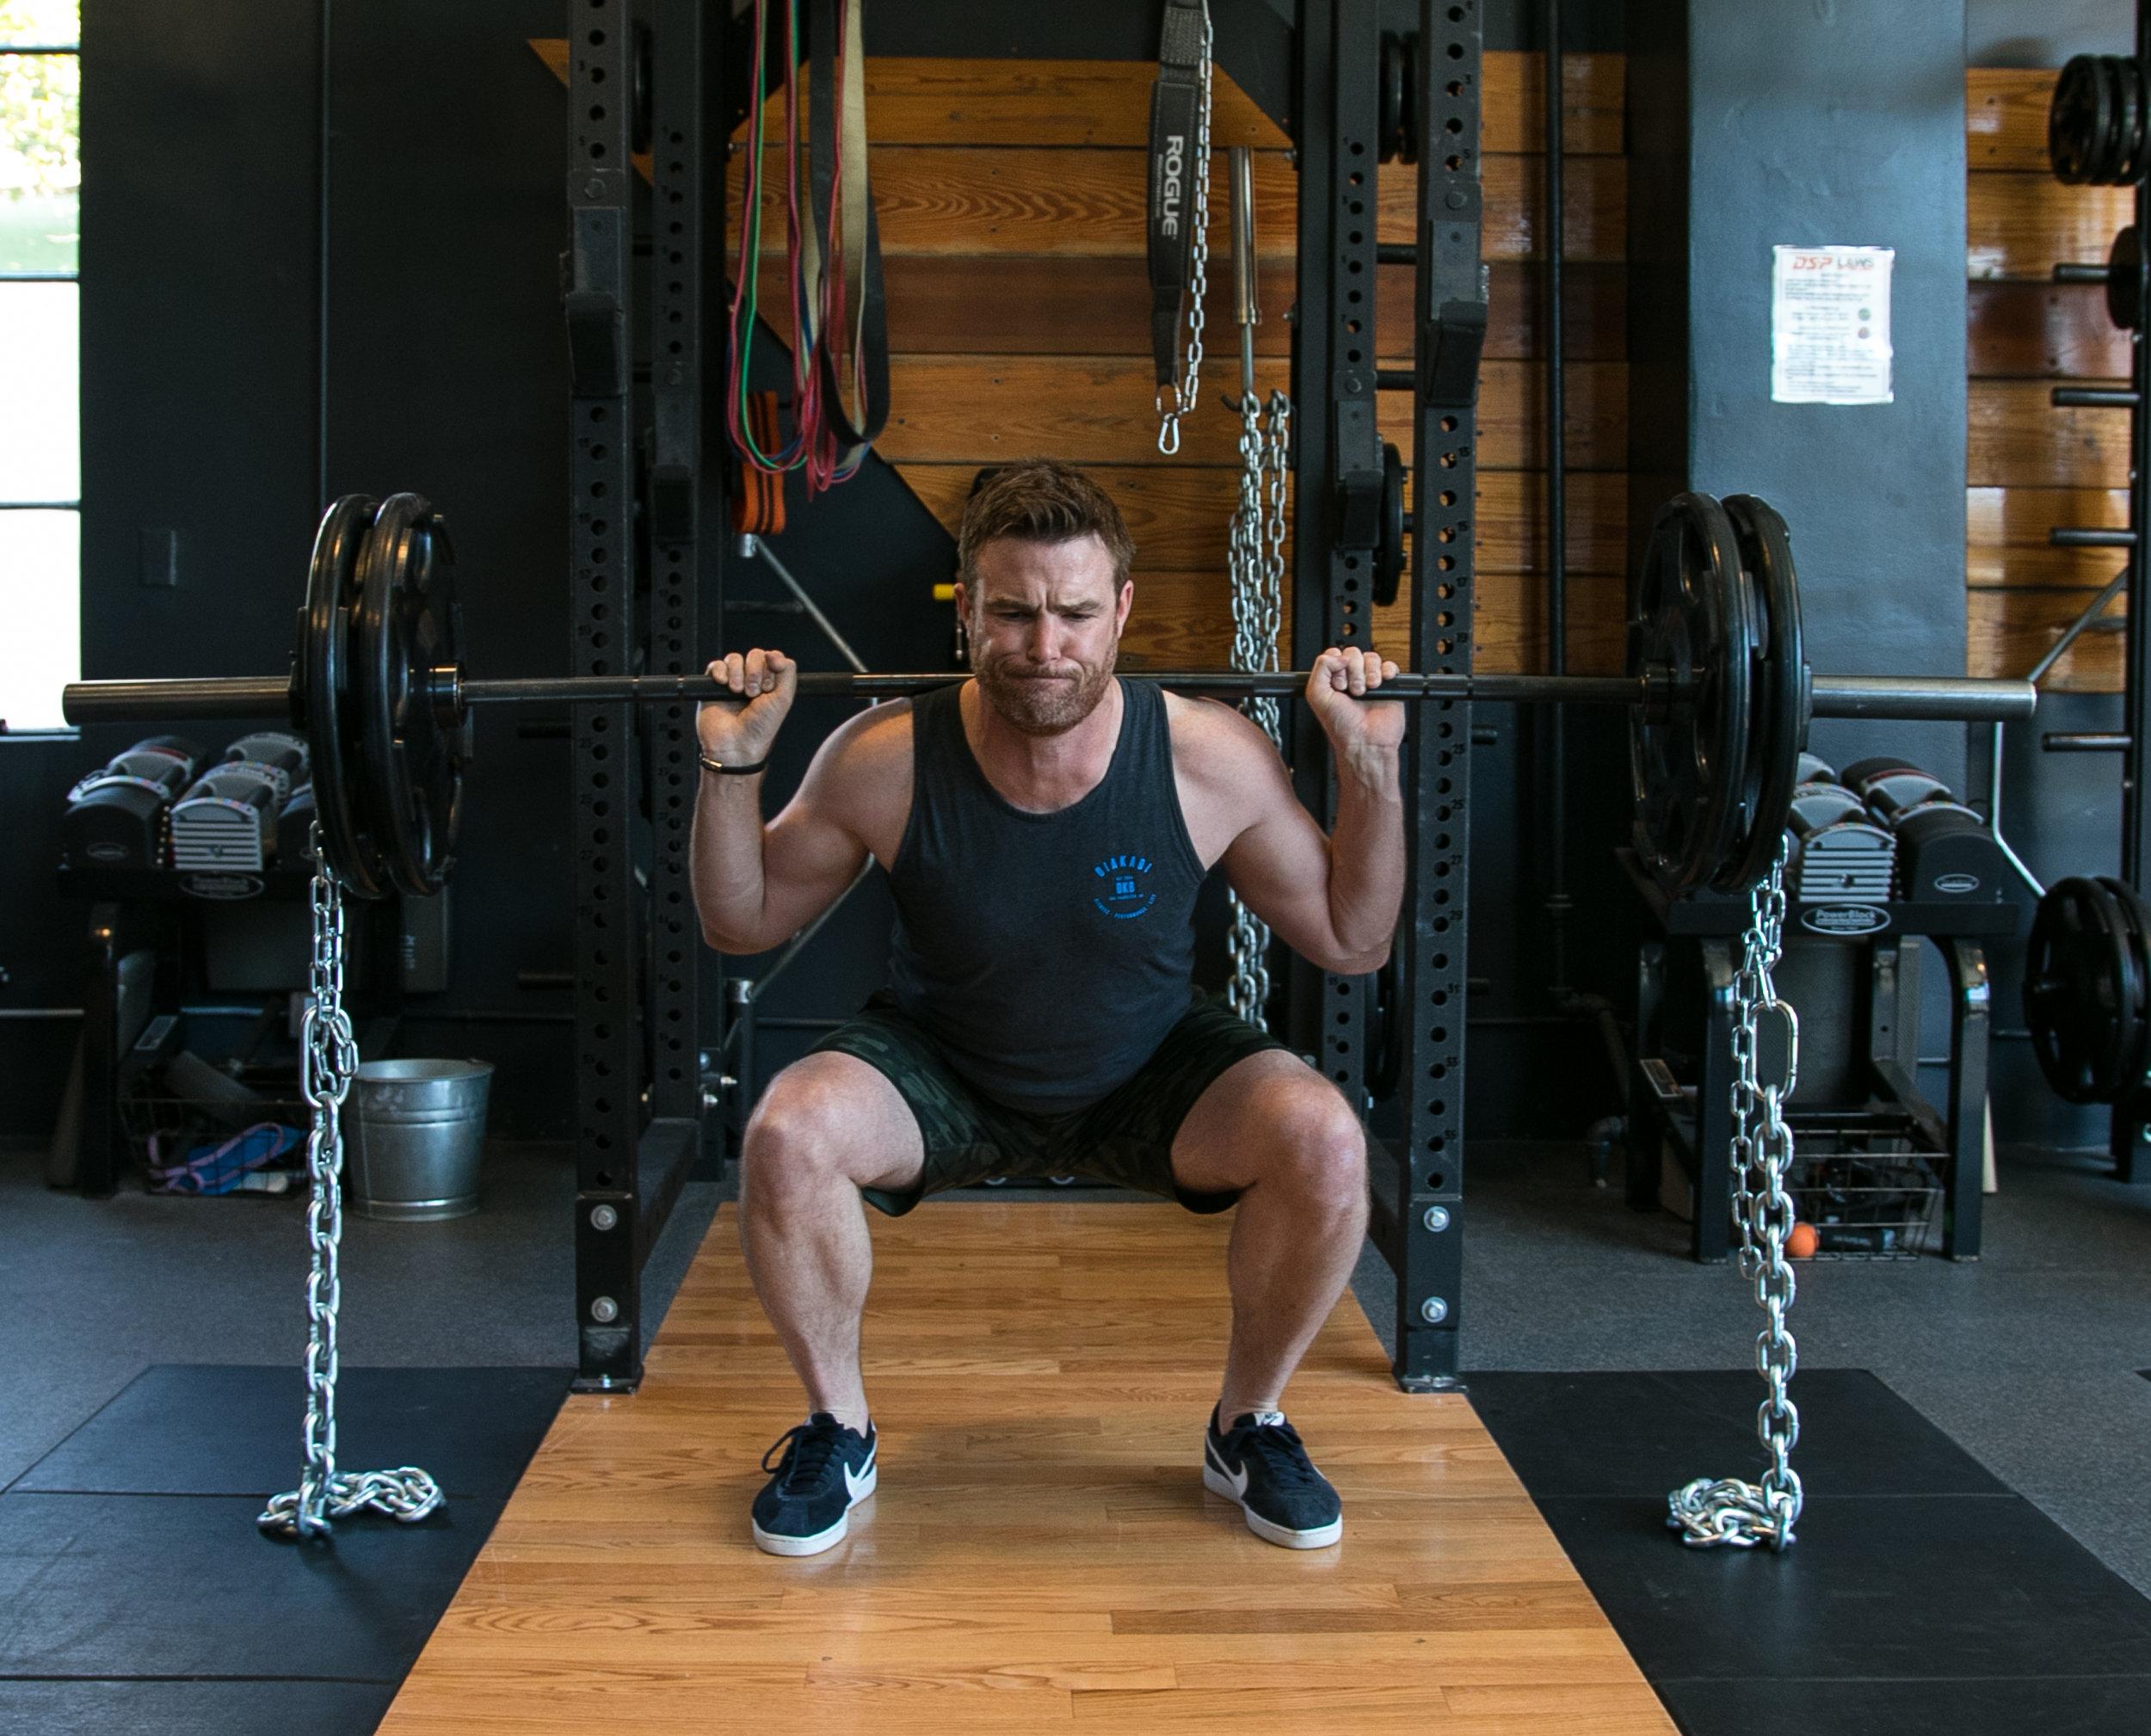 Gavin Birmingham barbell squat chains stability strength balance.jpg